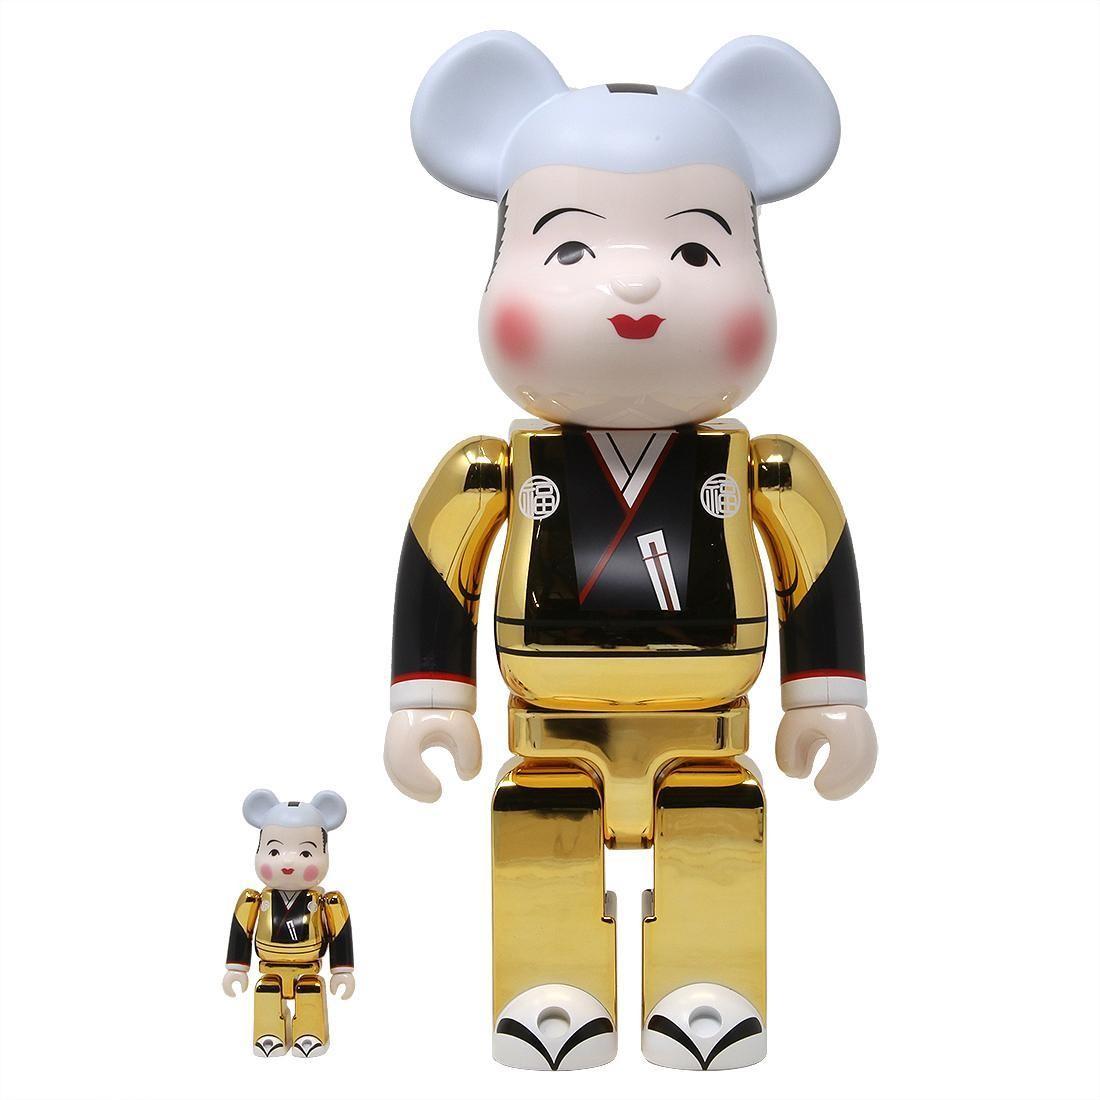 Medicom Fukusuke Gold Plated 100% 400% Bearbrick Figure Set (gold)